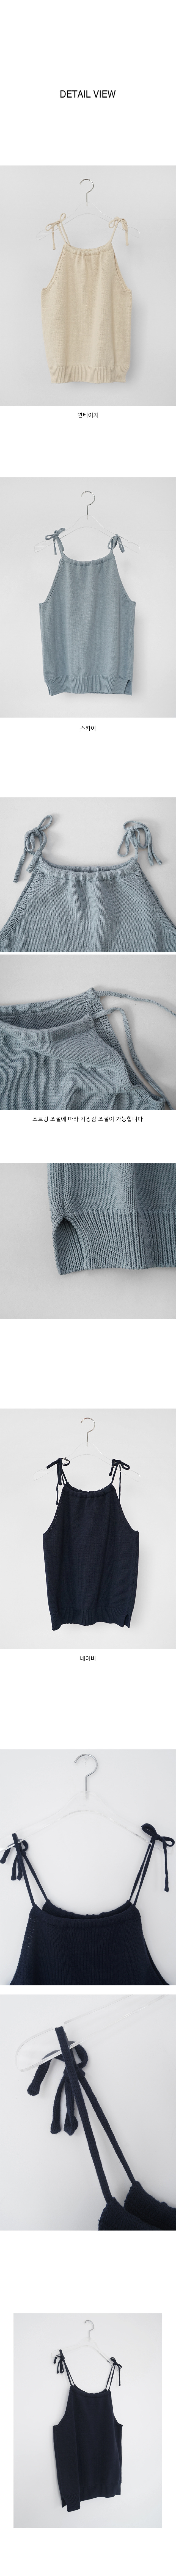 rope string knit sleeveless